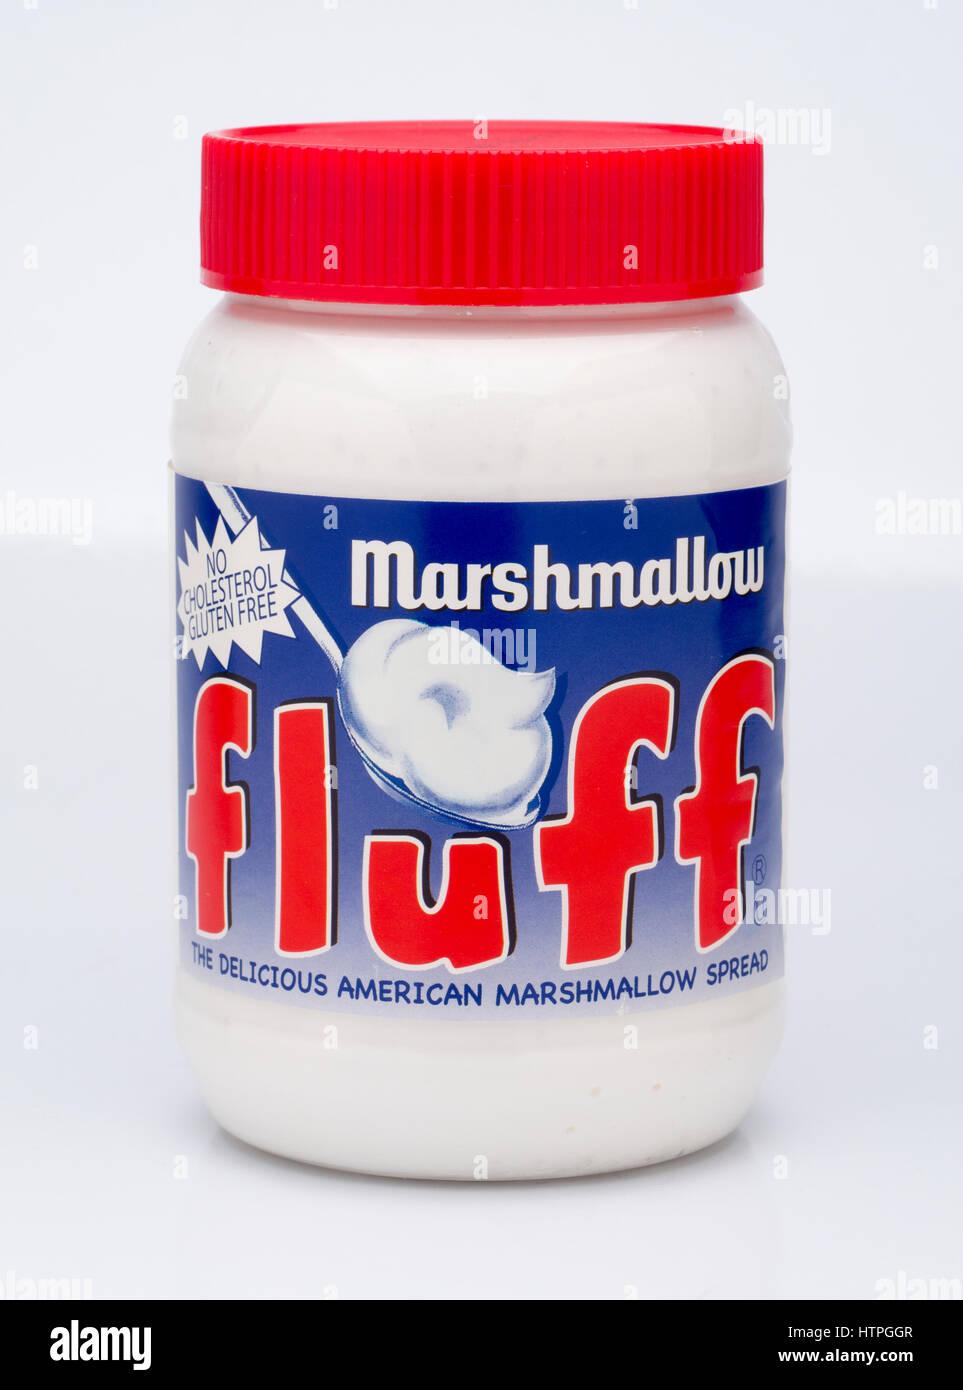 Jar of Marshmallow Fluff - Stock Image